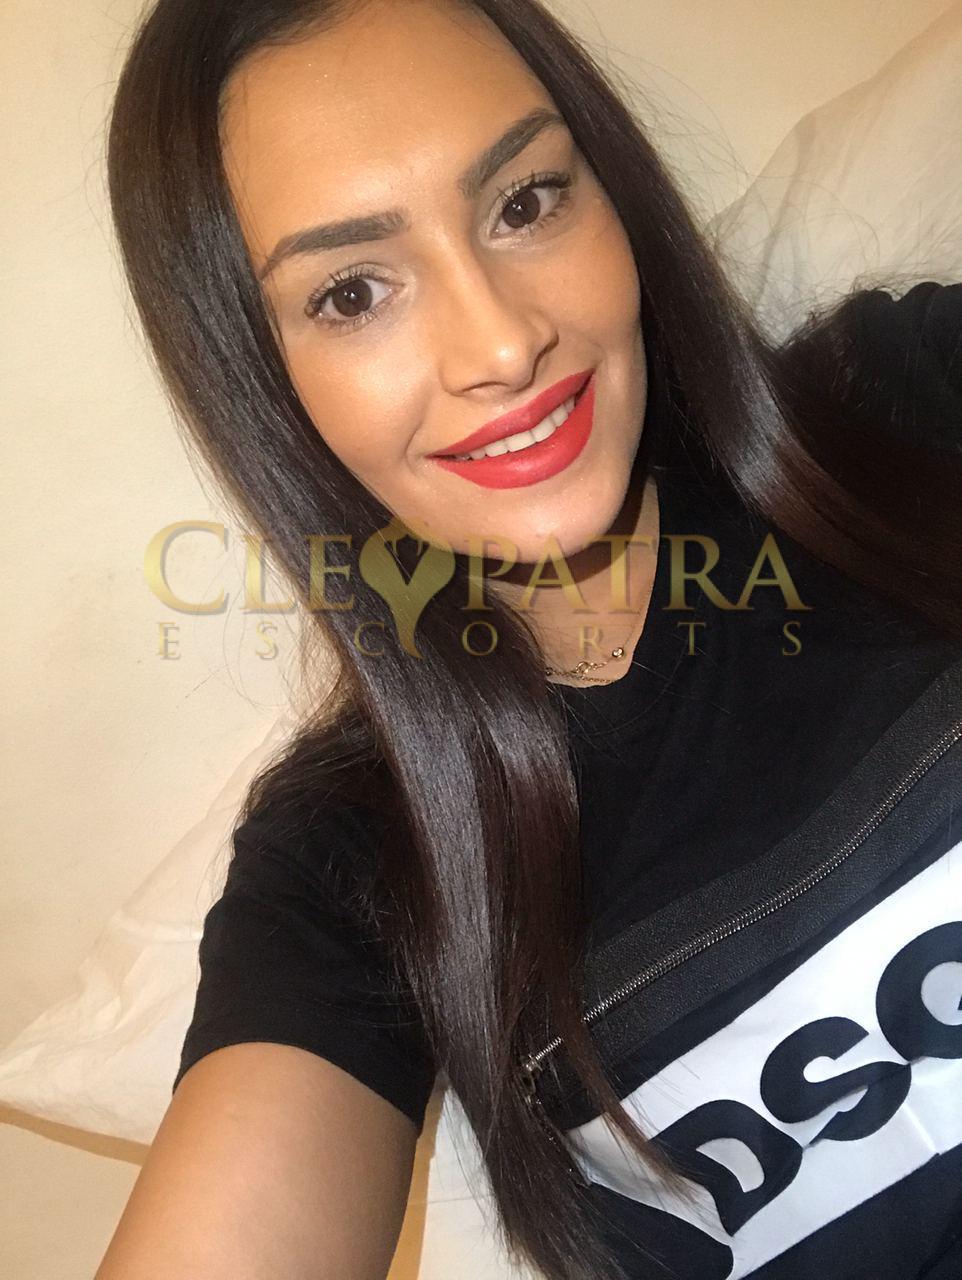 Alexandra from 24hr London Escorts